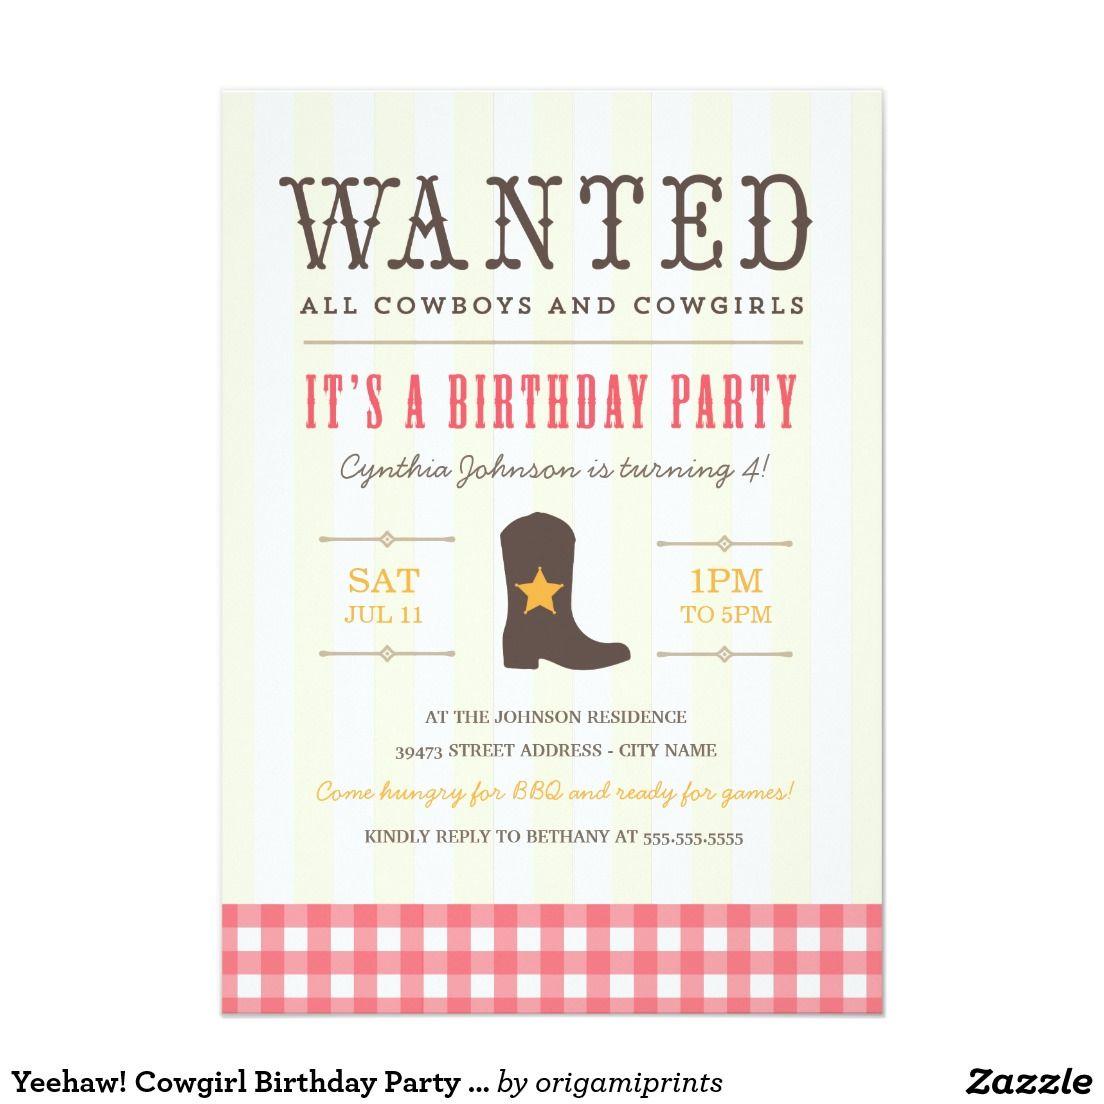 Yeehaw! Cowgirl Birthday Party Invitation | Cowgirl birthday ...